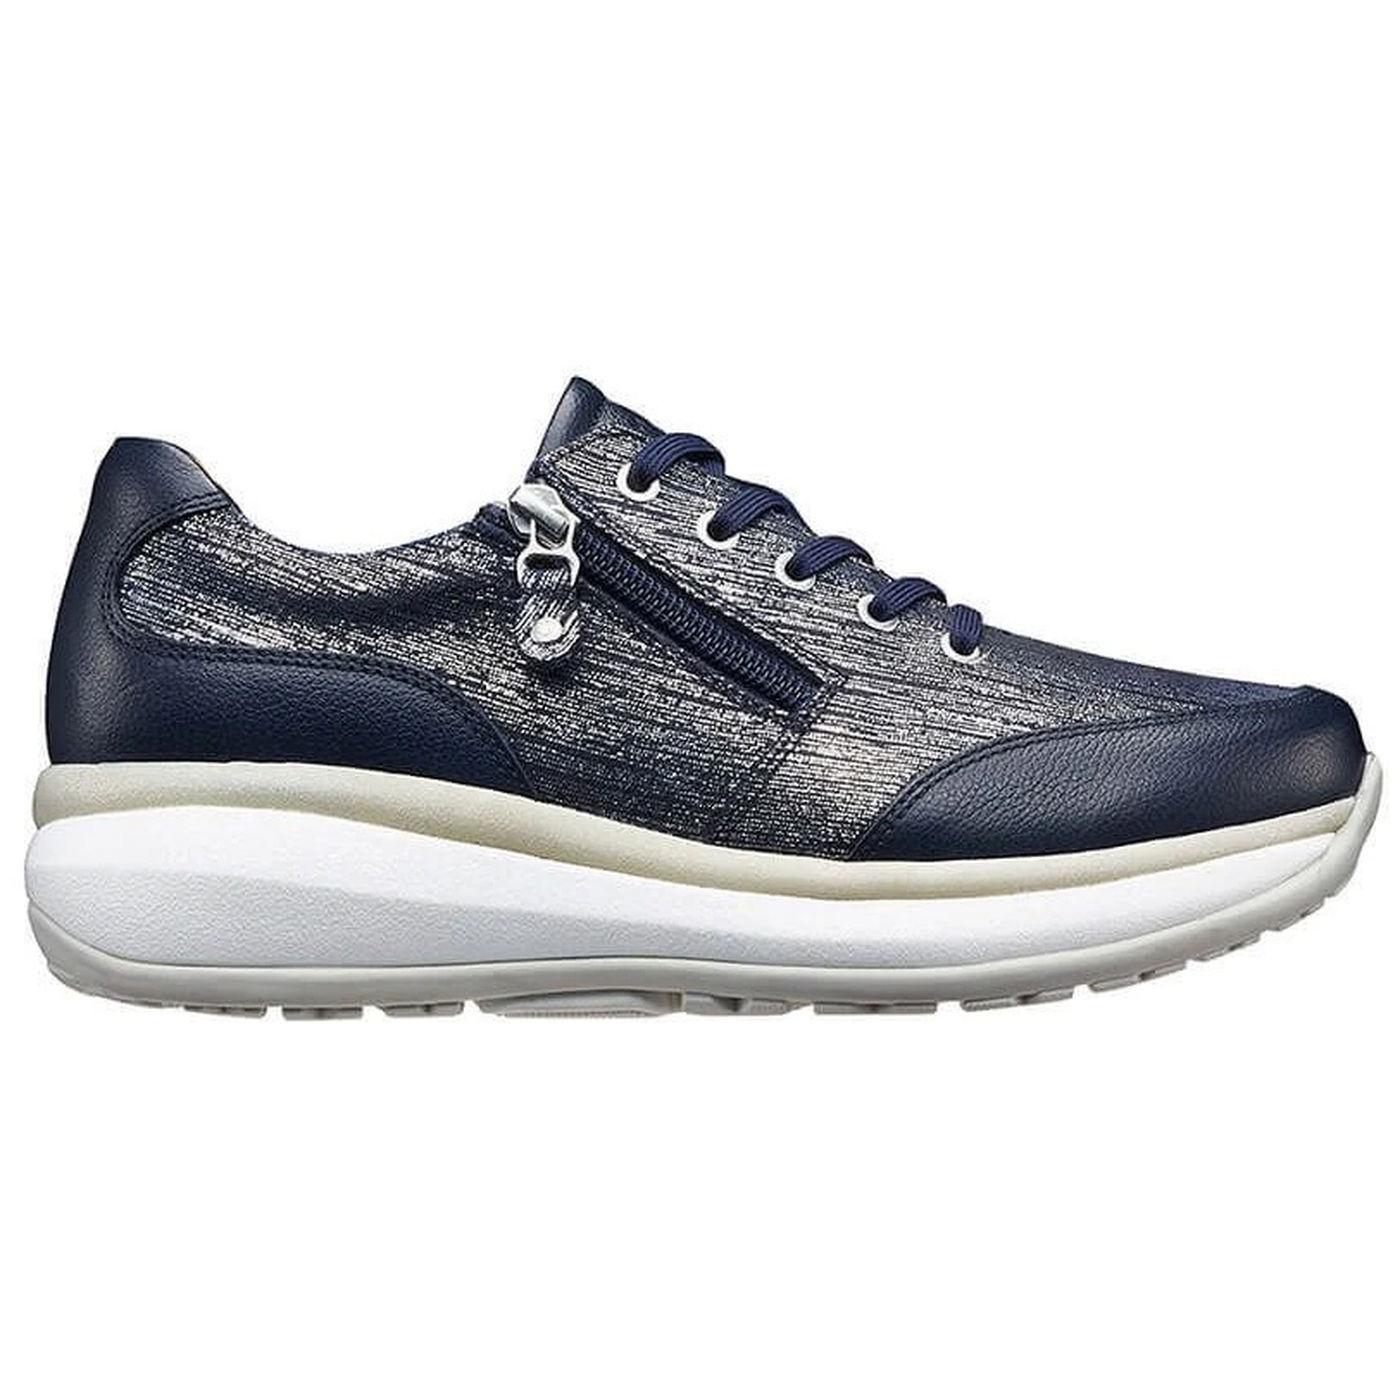 Joya Womens Rachel Shoes - Blue Metallic